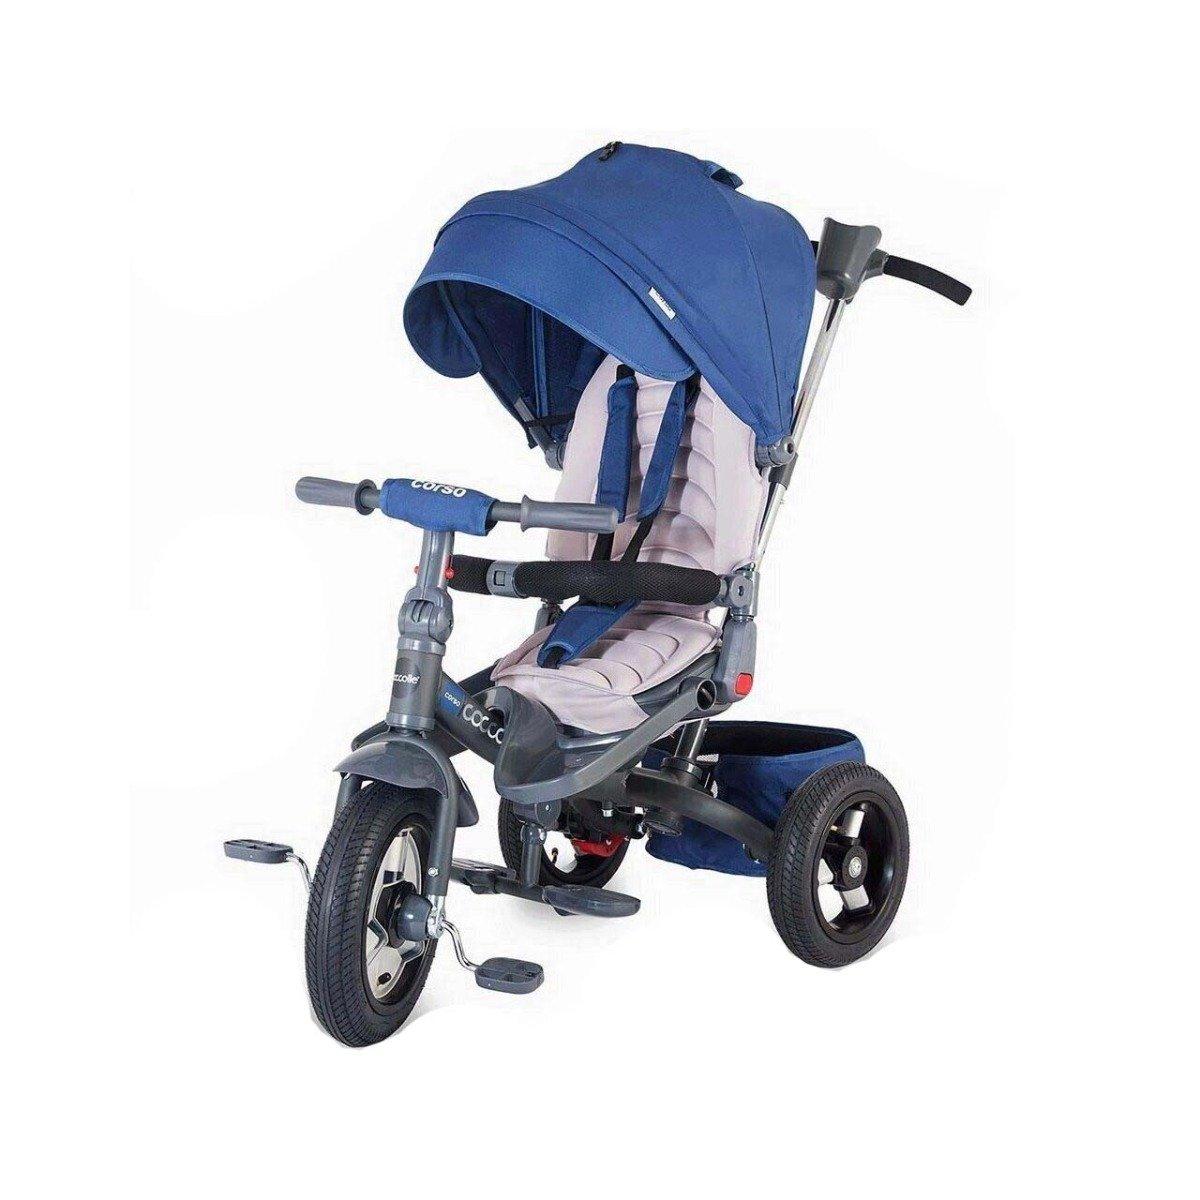 Tricicleta multifunctionala Corso Coccolle, Albastru imagine